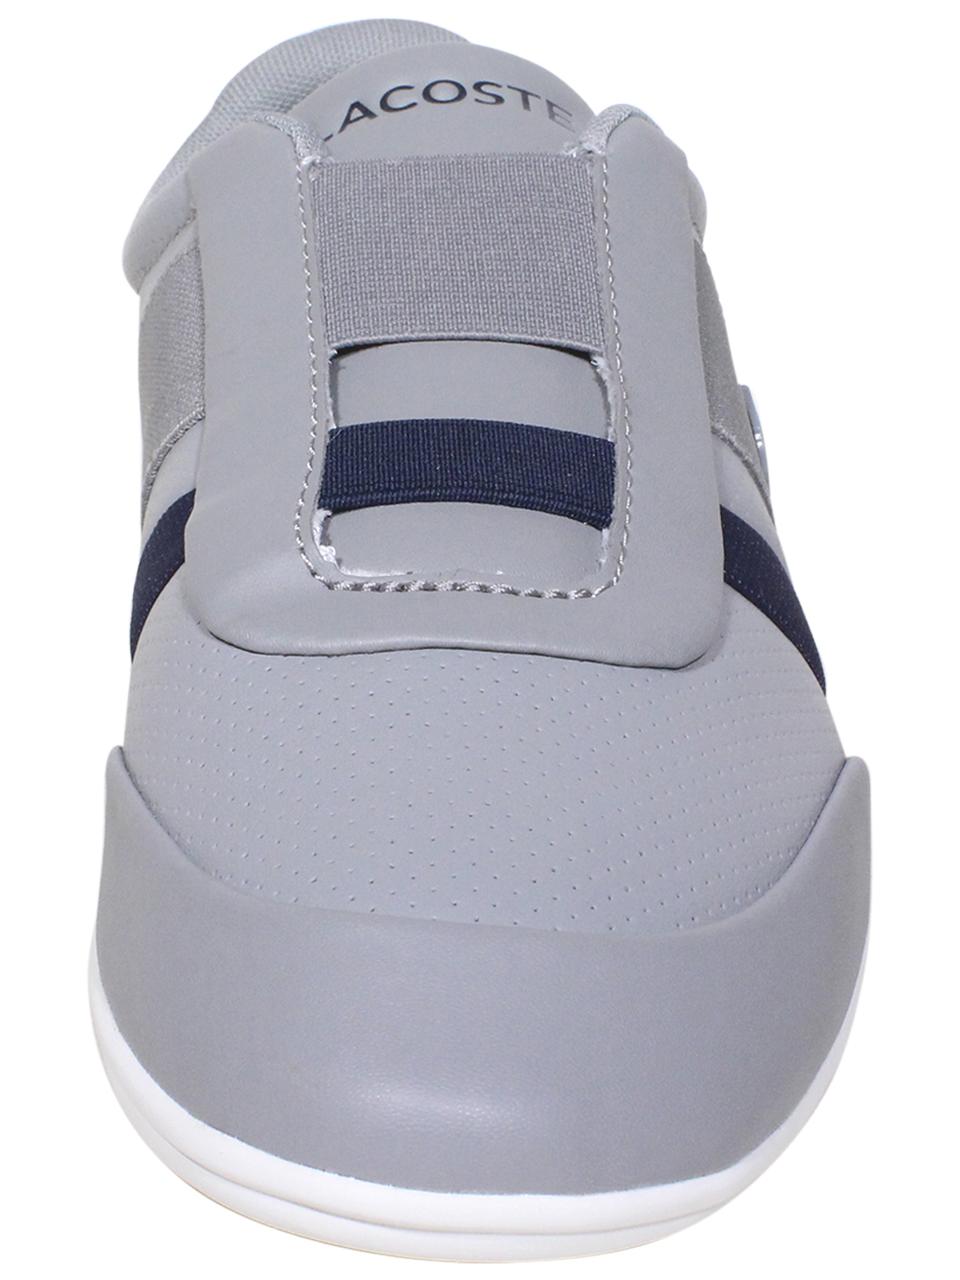 Lacoste-Misano-Elastic-318-Sneakers-Men-039-s-Low-Top-Shoes thumbnail 16